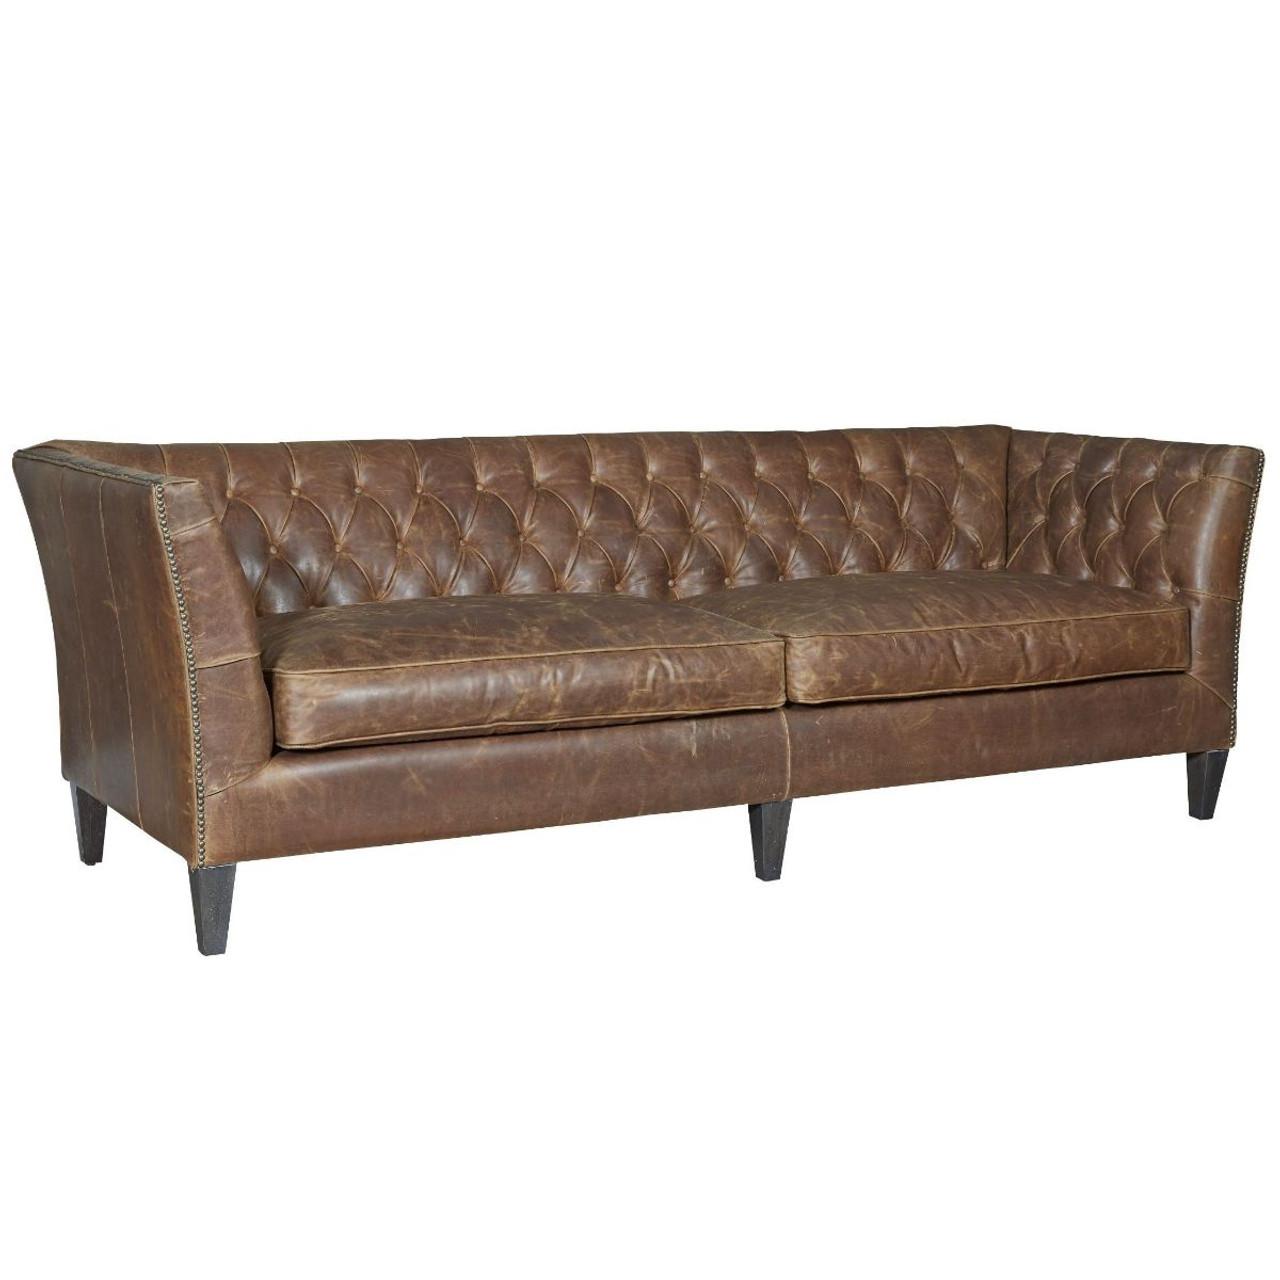 Duncan Chestnut Tufted Leather Sofa 98\